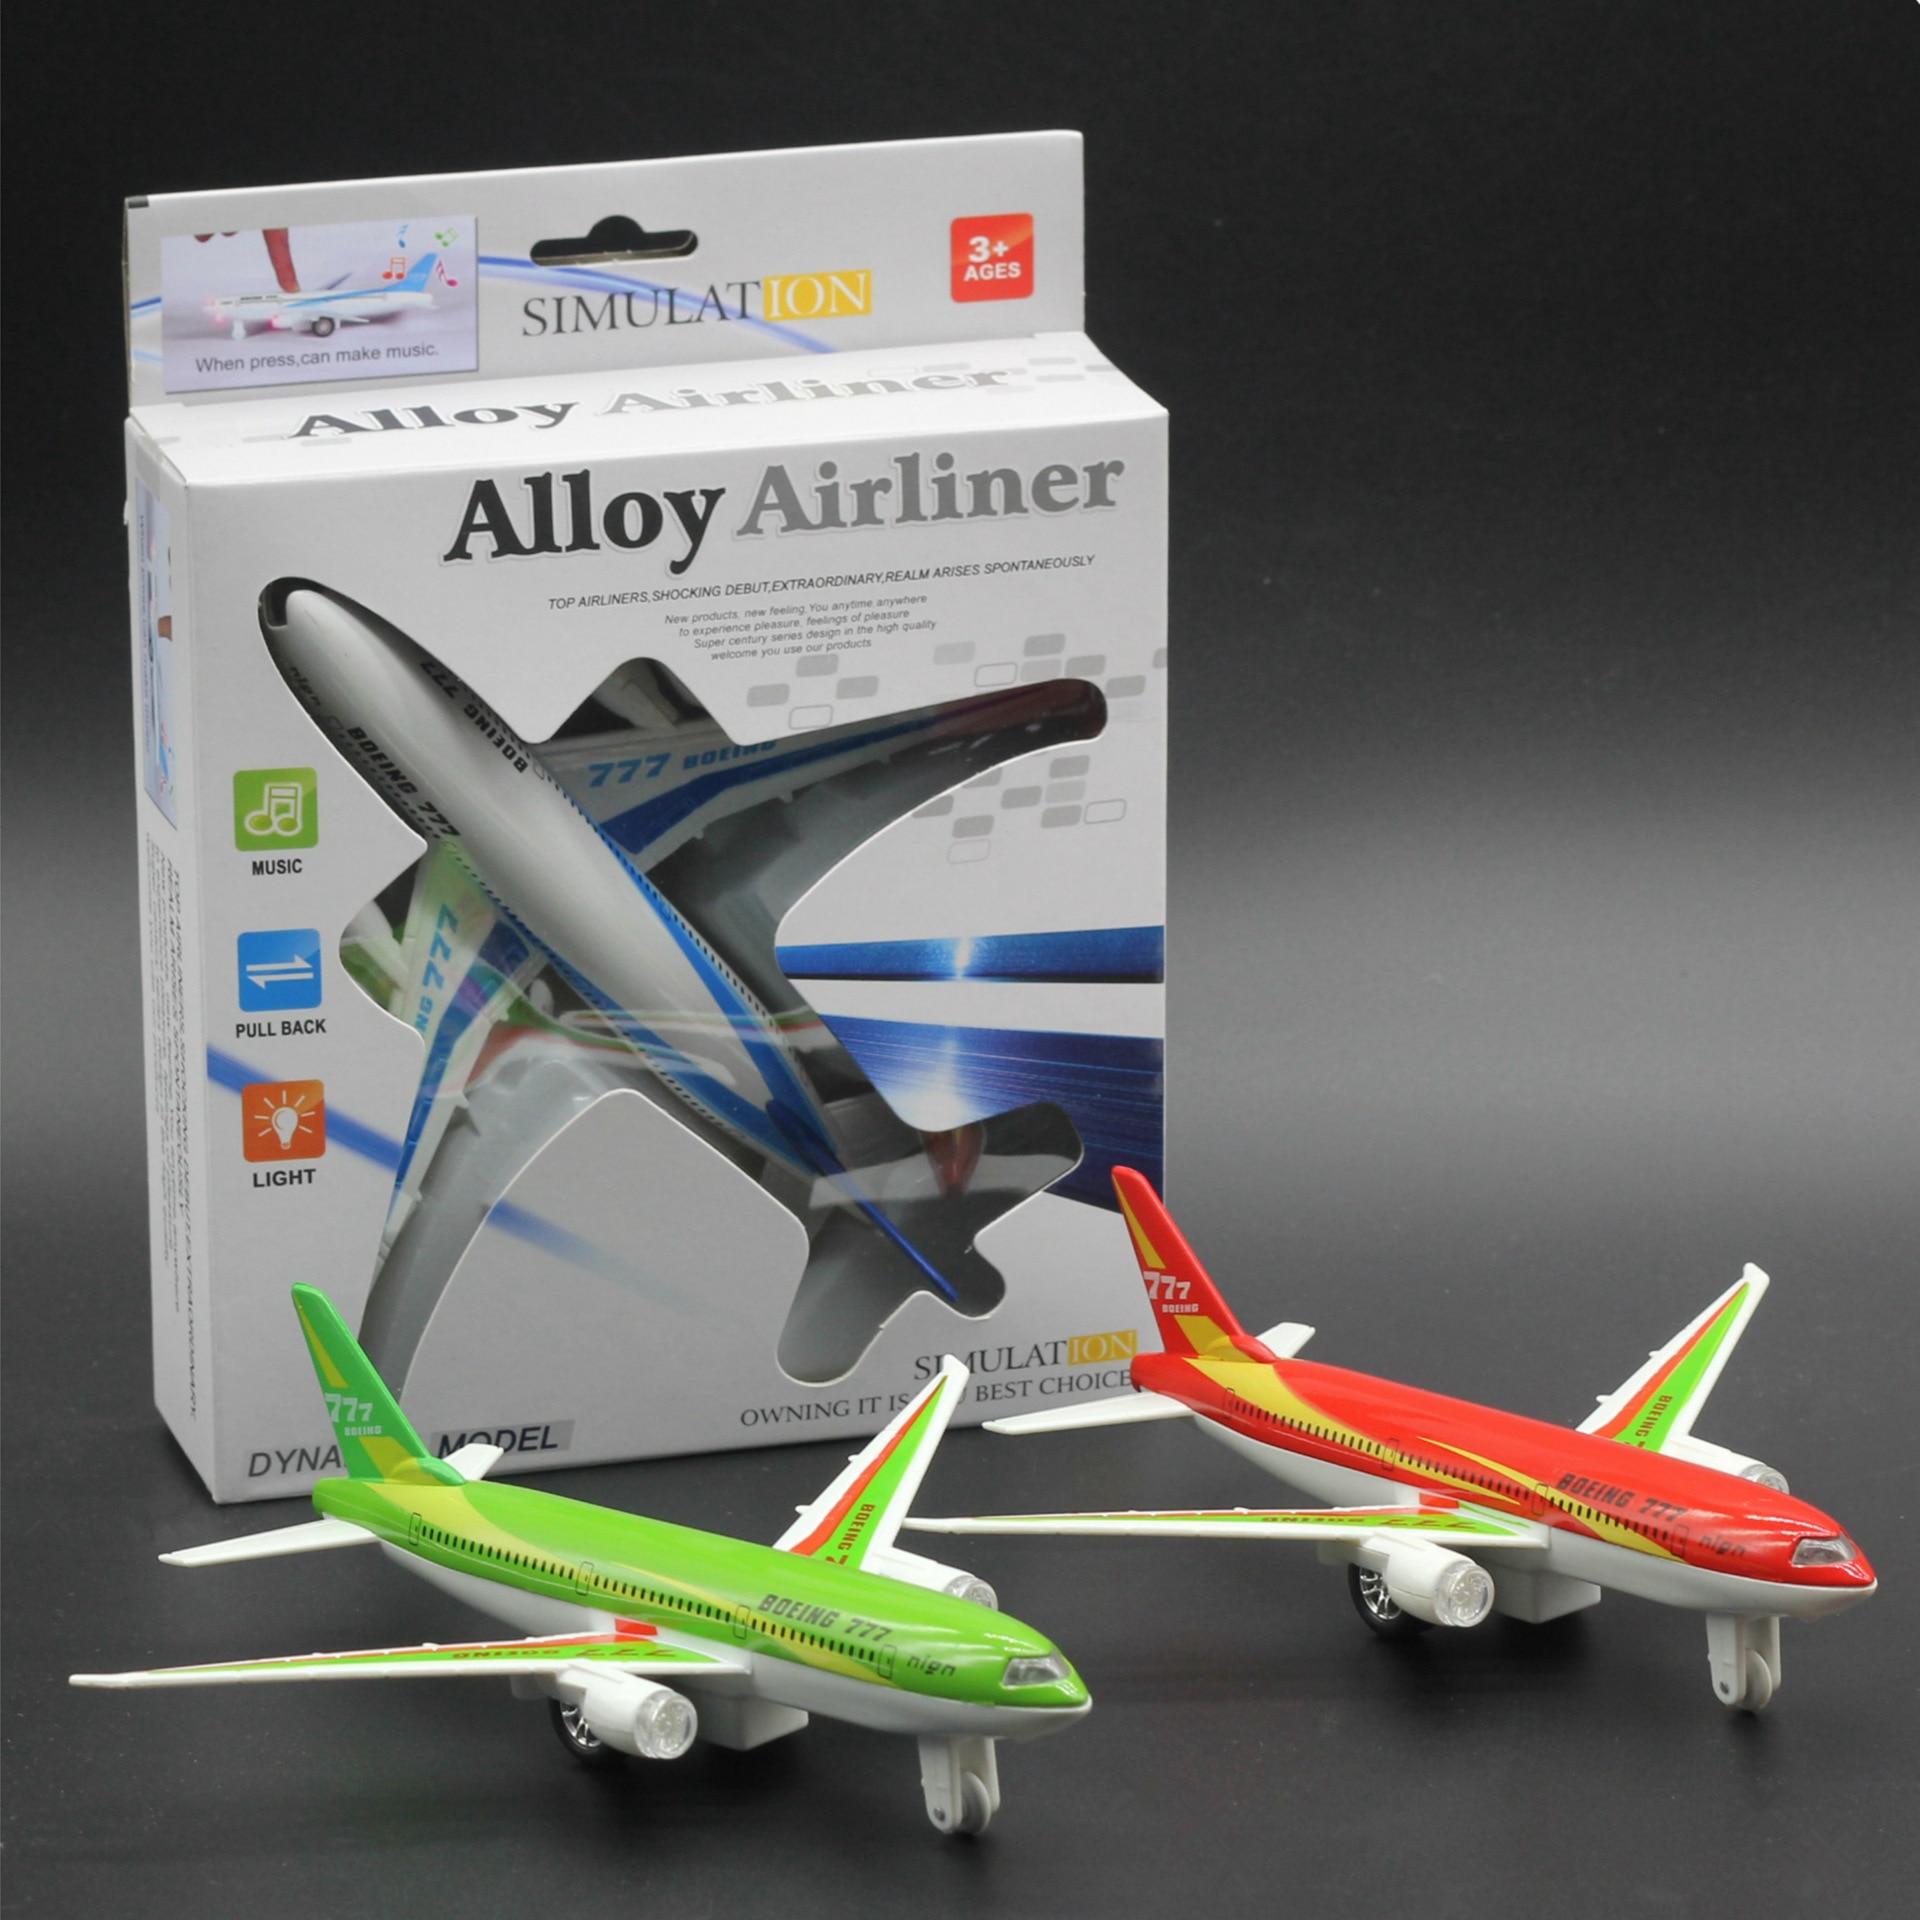 Kinderspeelgoed, Legering modelvliegtuig, Boeing 777 airbus, Trek vliegtuig, Children's educatief model speelgoed. Vliegtuig